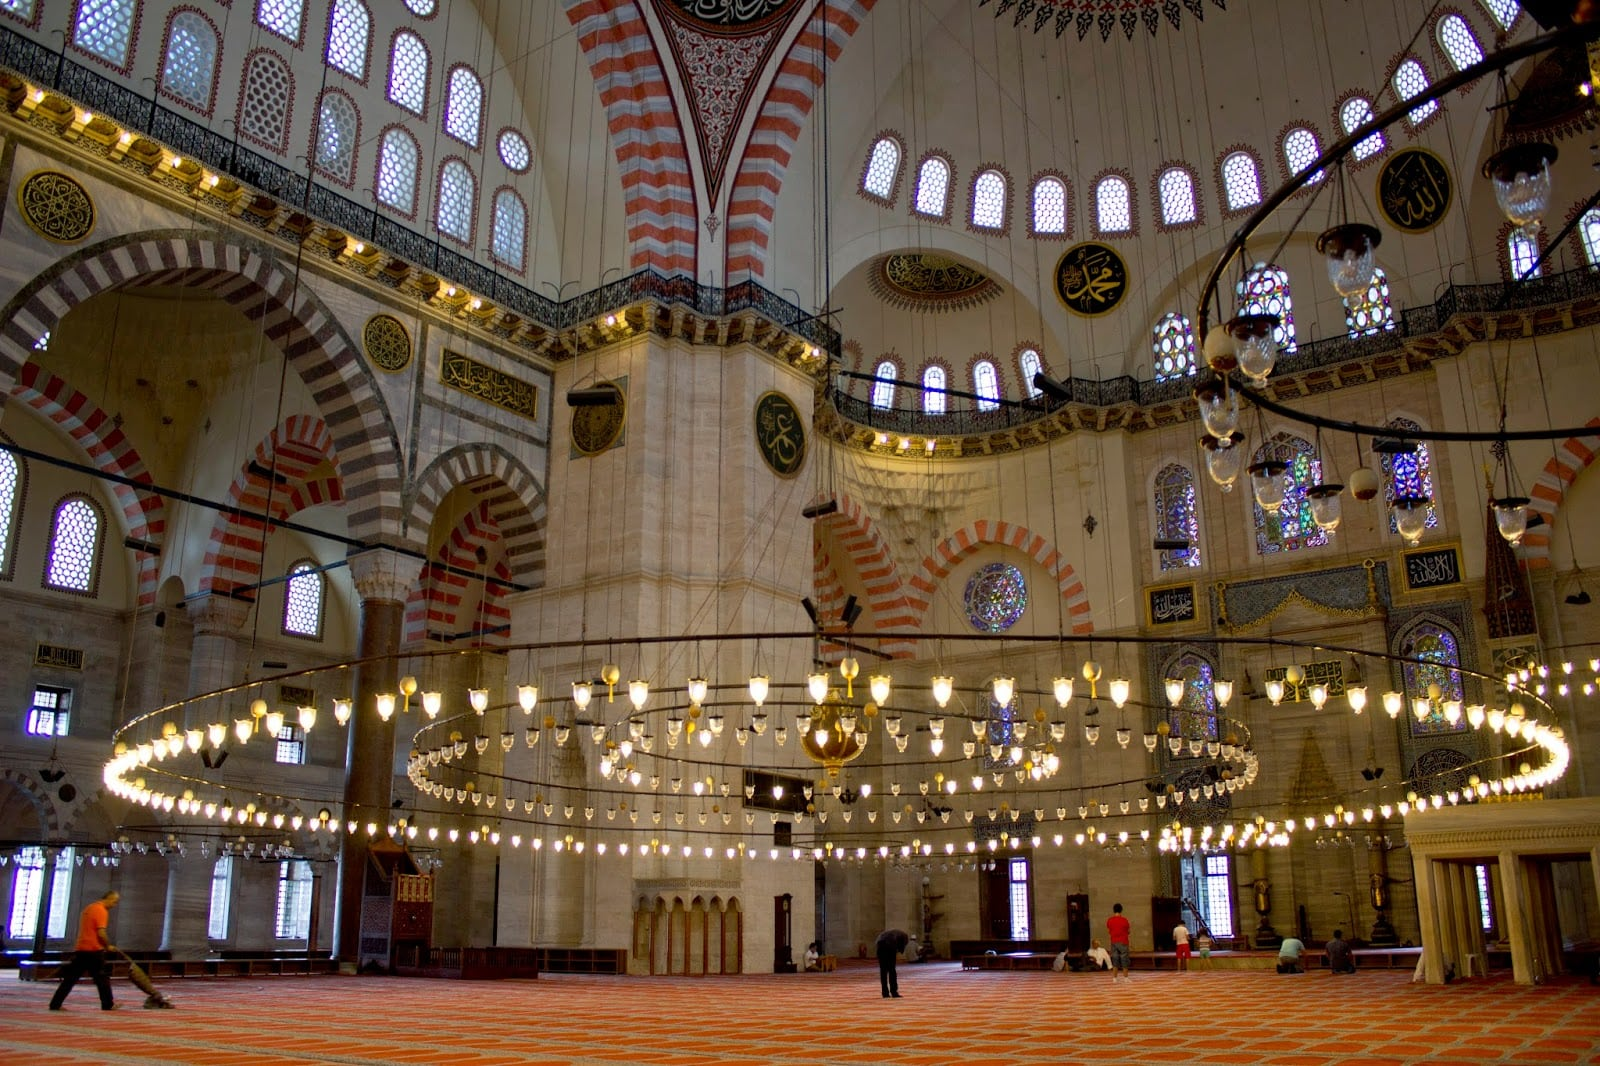 اجمل مساجد اسطنبول